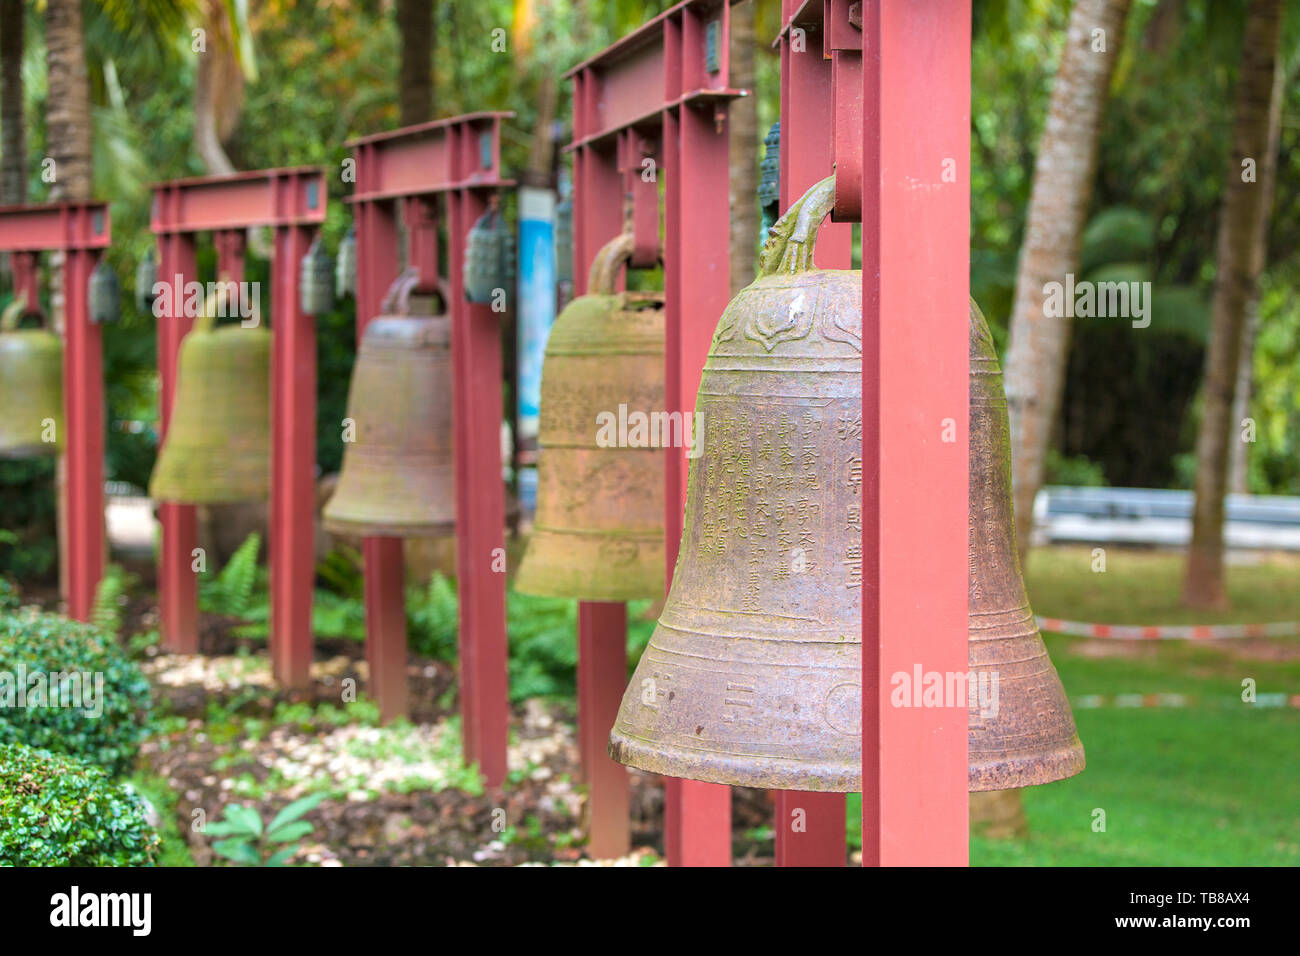 Chisinau, Moldova November 23, 2017: Square Bells in the center of Buddhism Nanshan on the island of Hainan in China Stock Photo